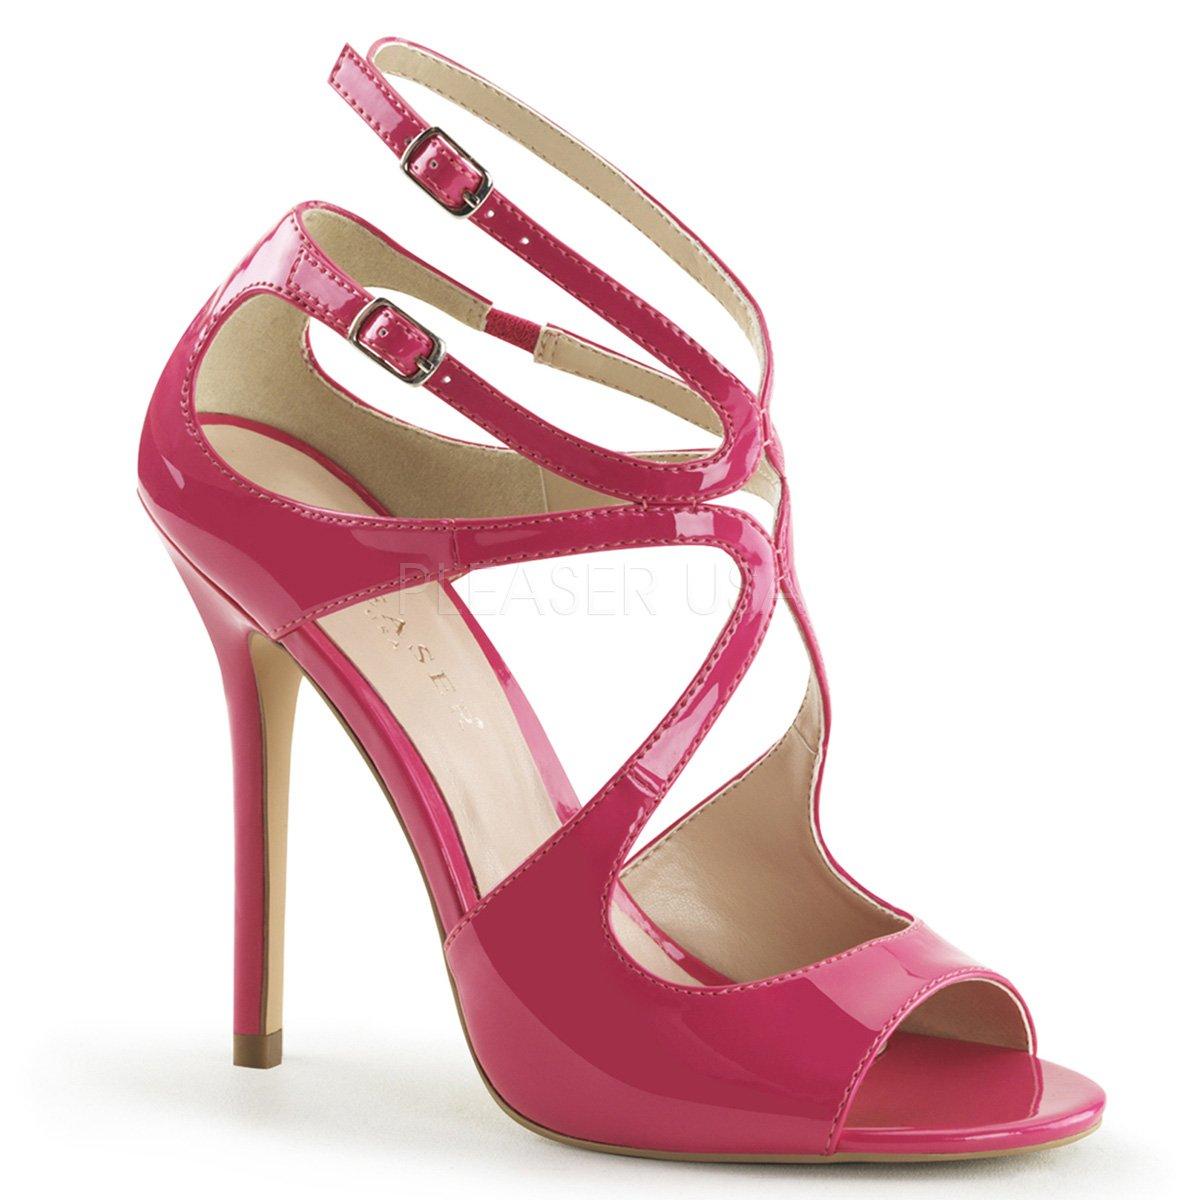 Higher-Heels PleaserUSA Riemchen-Sandaletten Riemchen-Sandaletten Riemchen-Sandaletten Amuse-15 Lack hot Rosa c5eea6